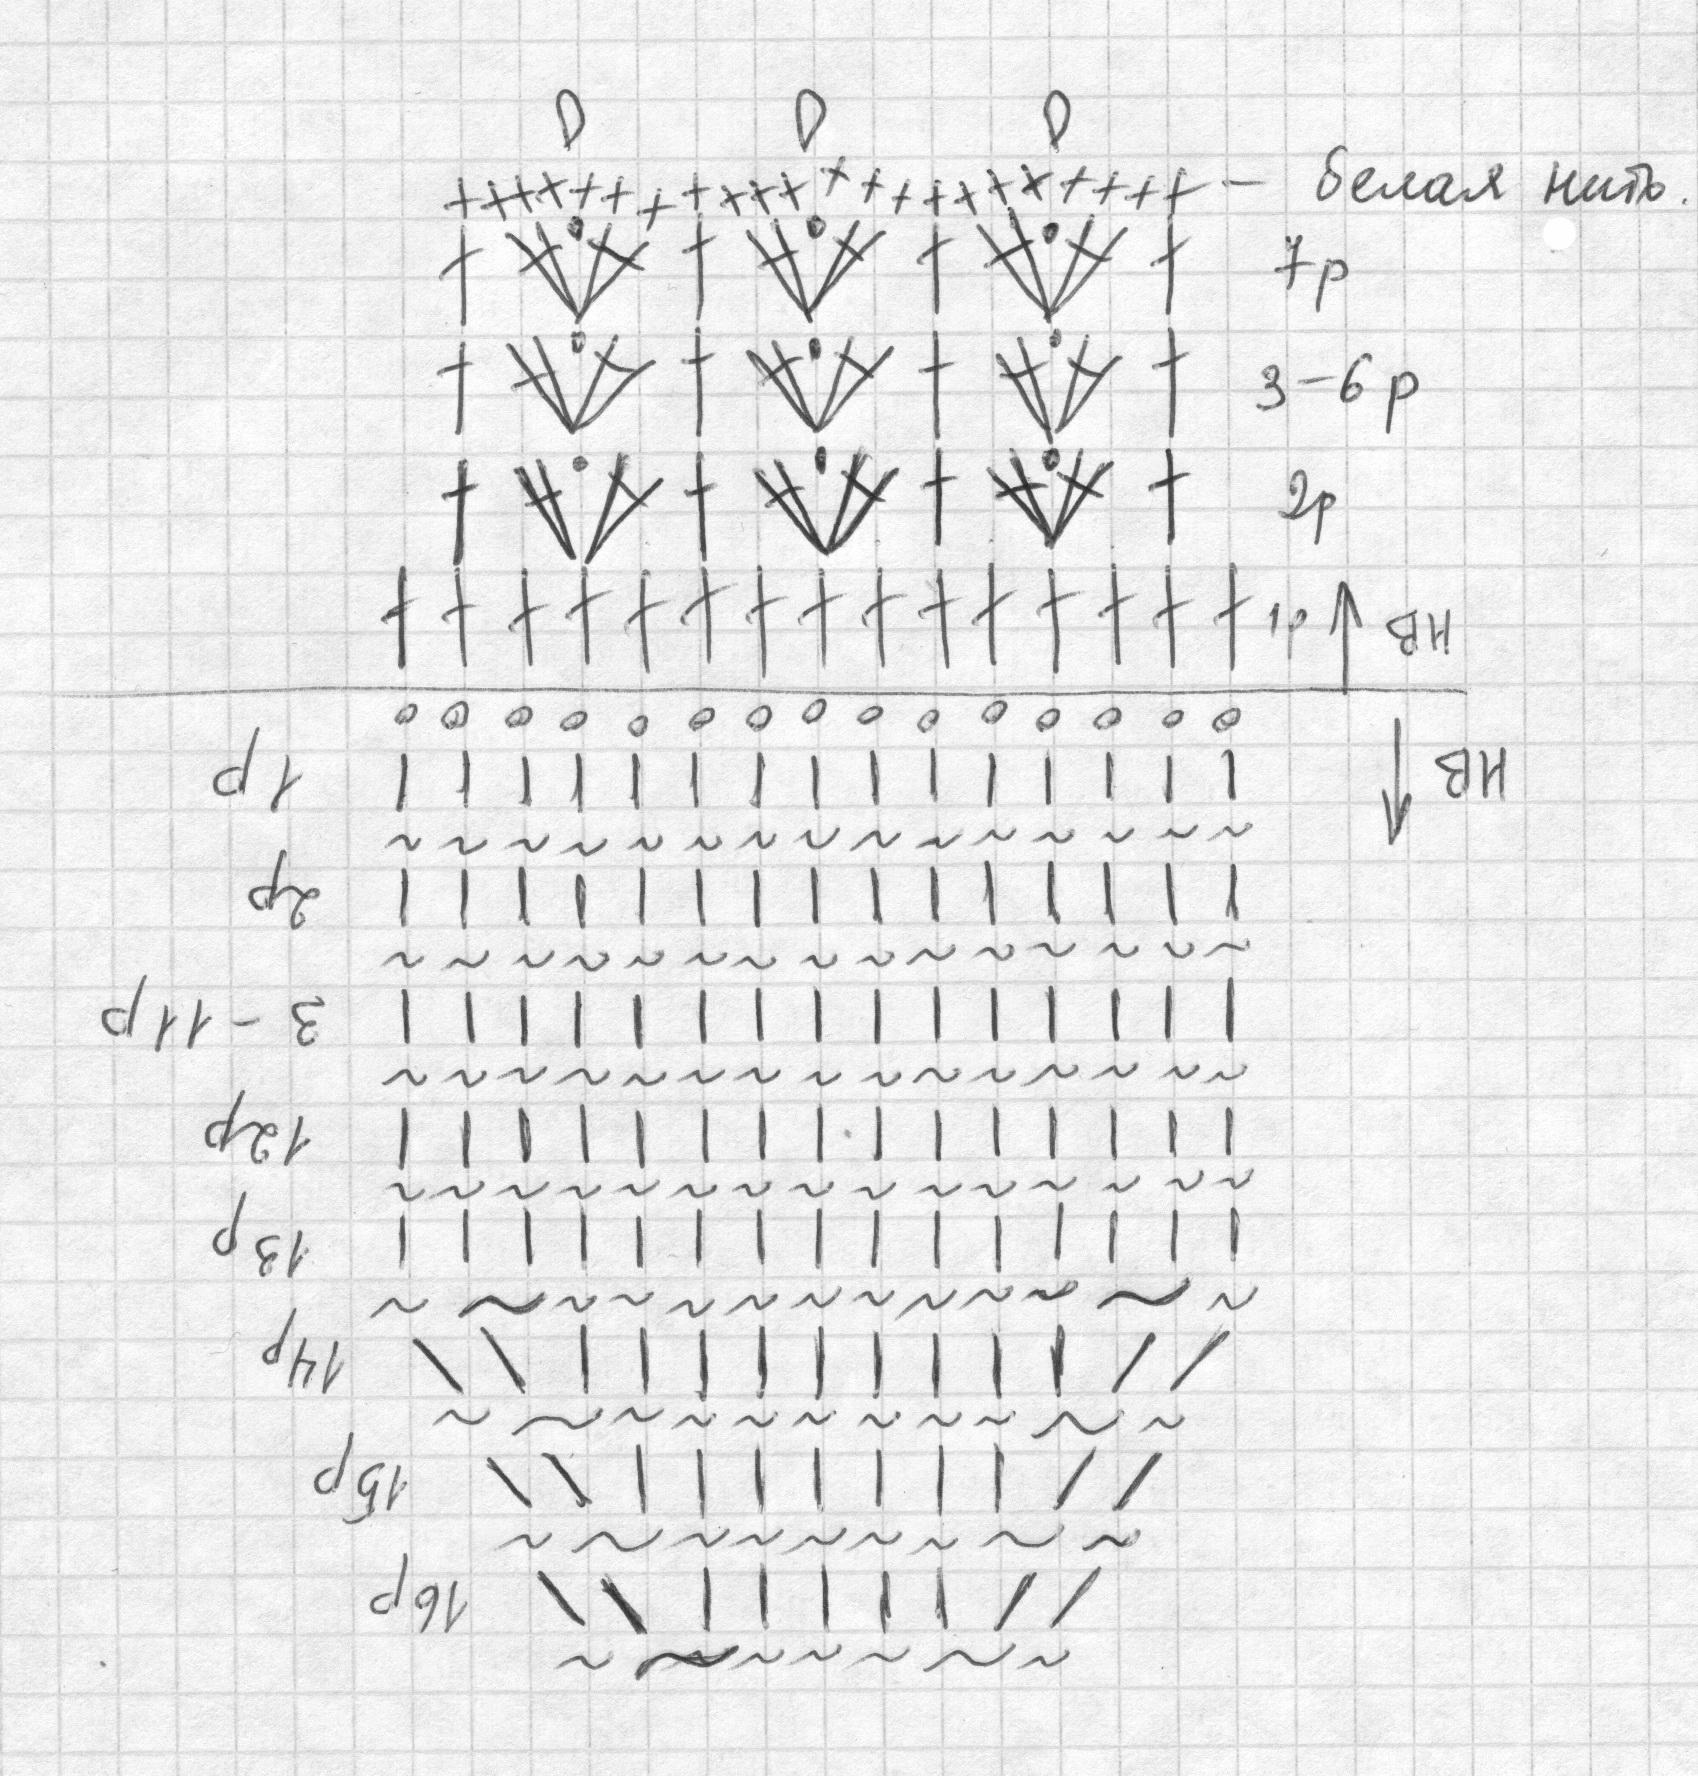 Варежки для новорожденных спицами без пальчика схема